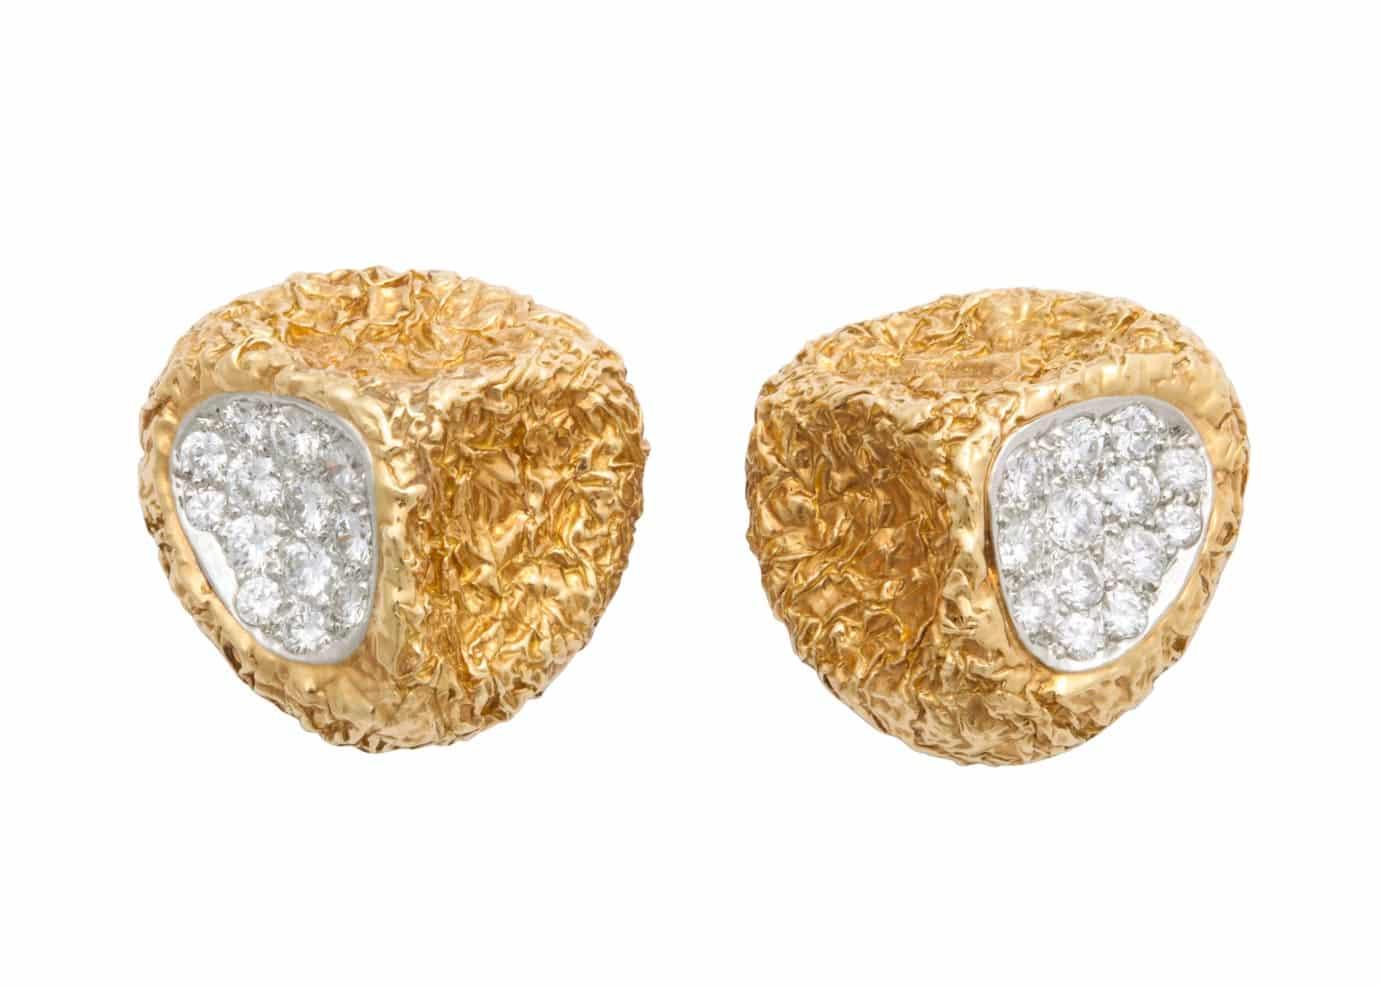 vca modernist textured earrings